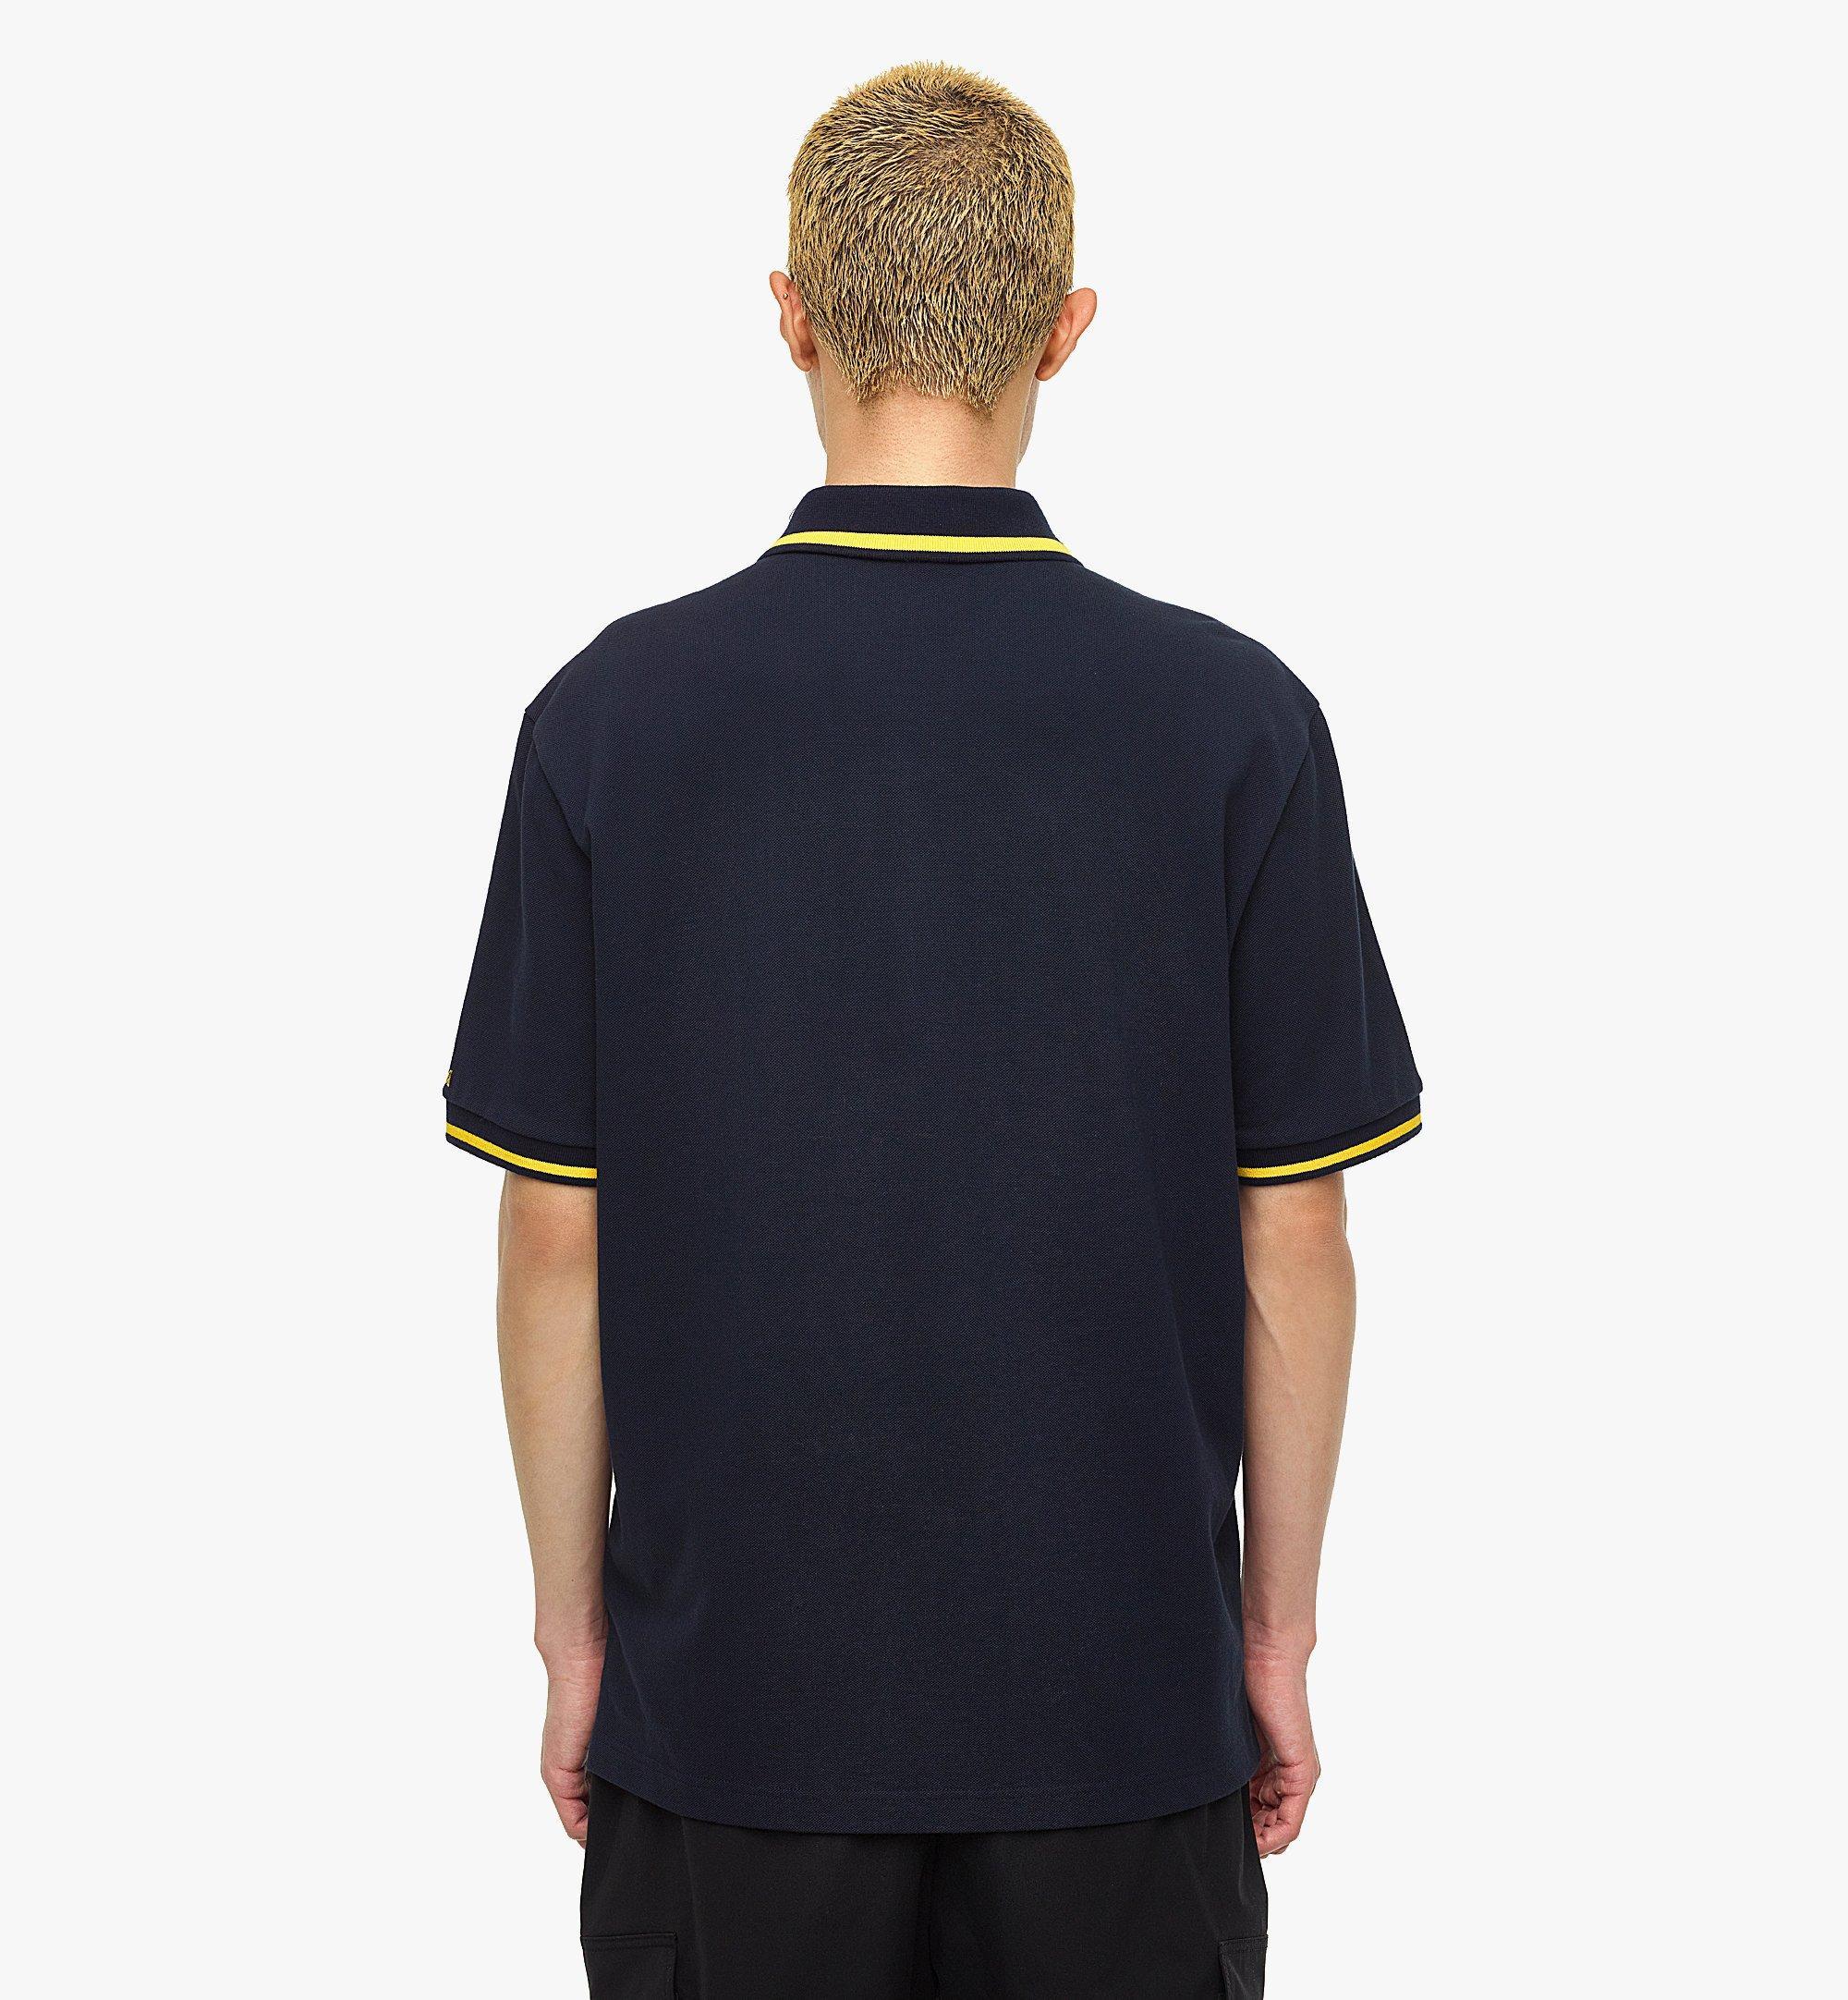 MCM MCM x SAMBYPEN Men's Polo Shirt Blue MHTBASP01VY00L Alternate View 3